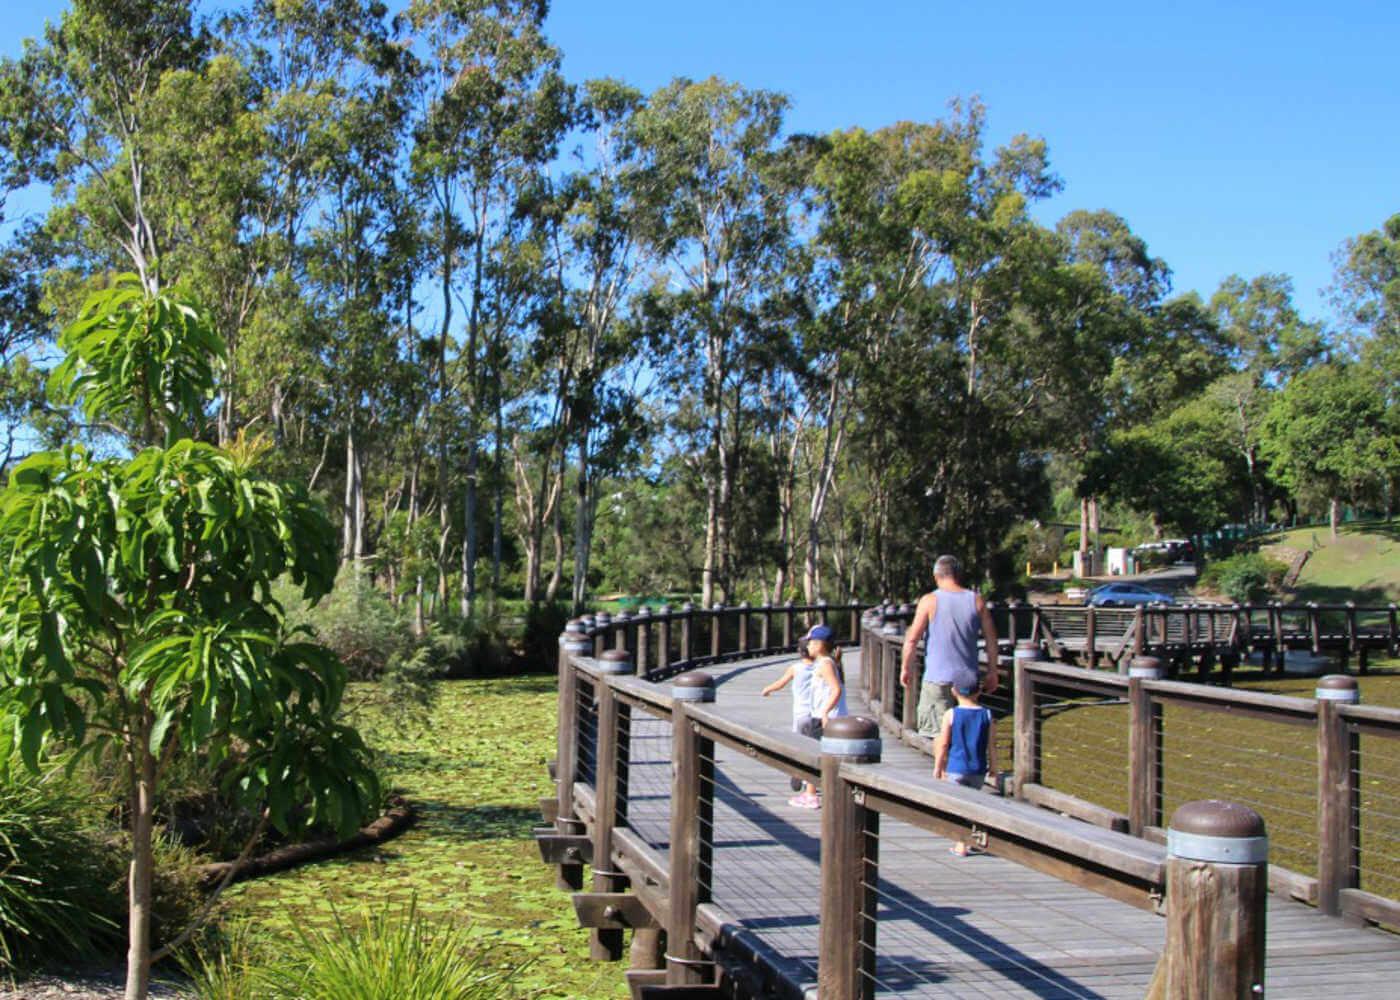 Gold Coast's Botanical Gardens